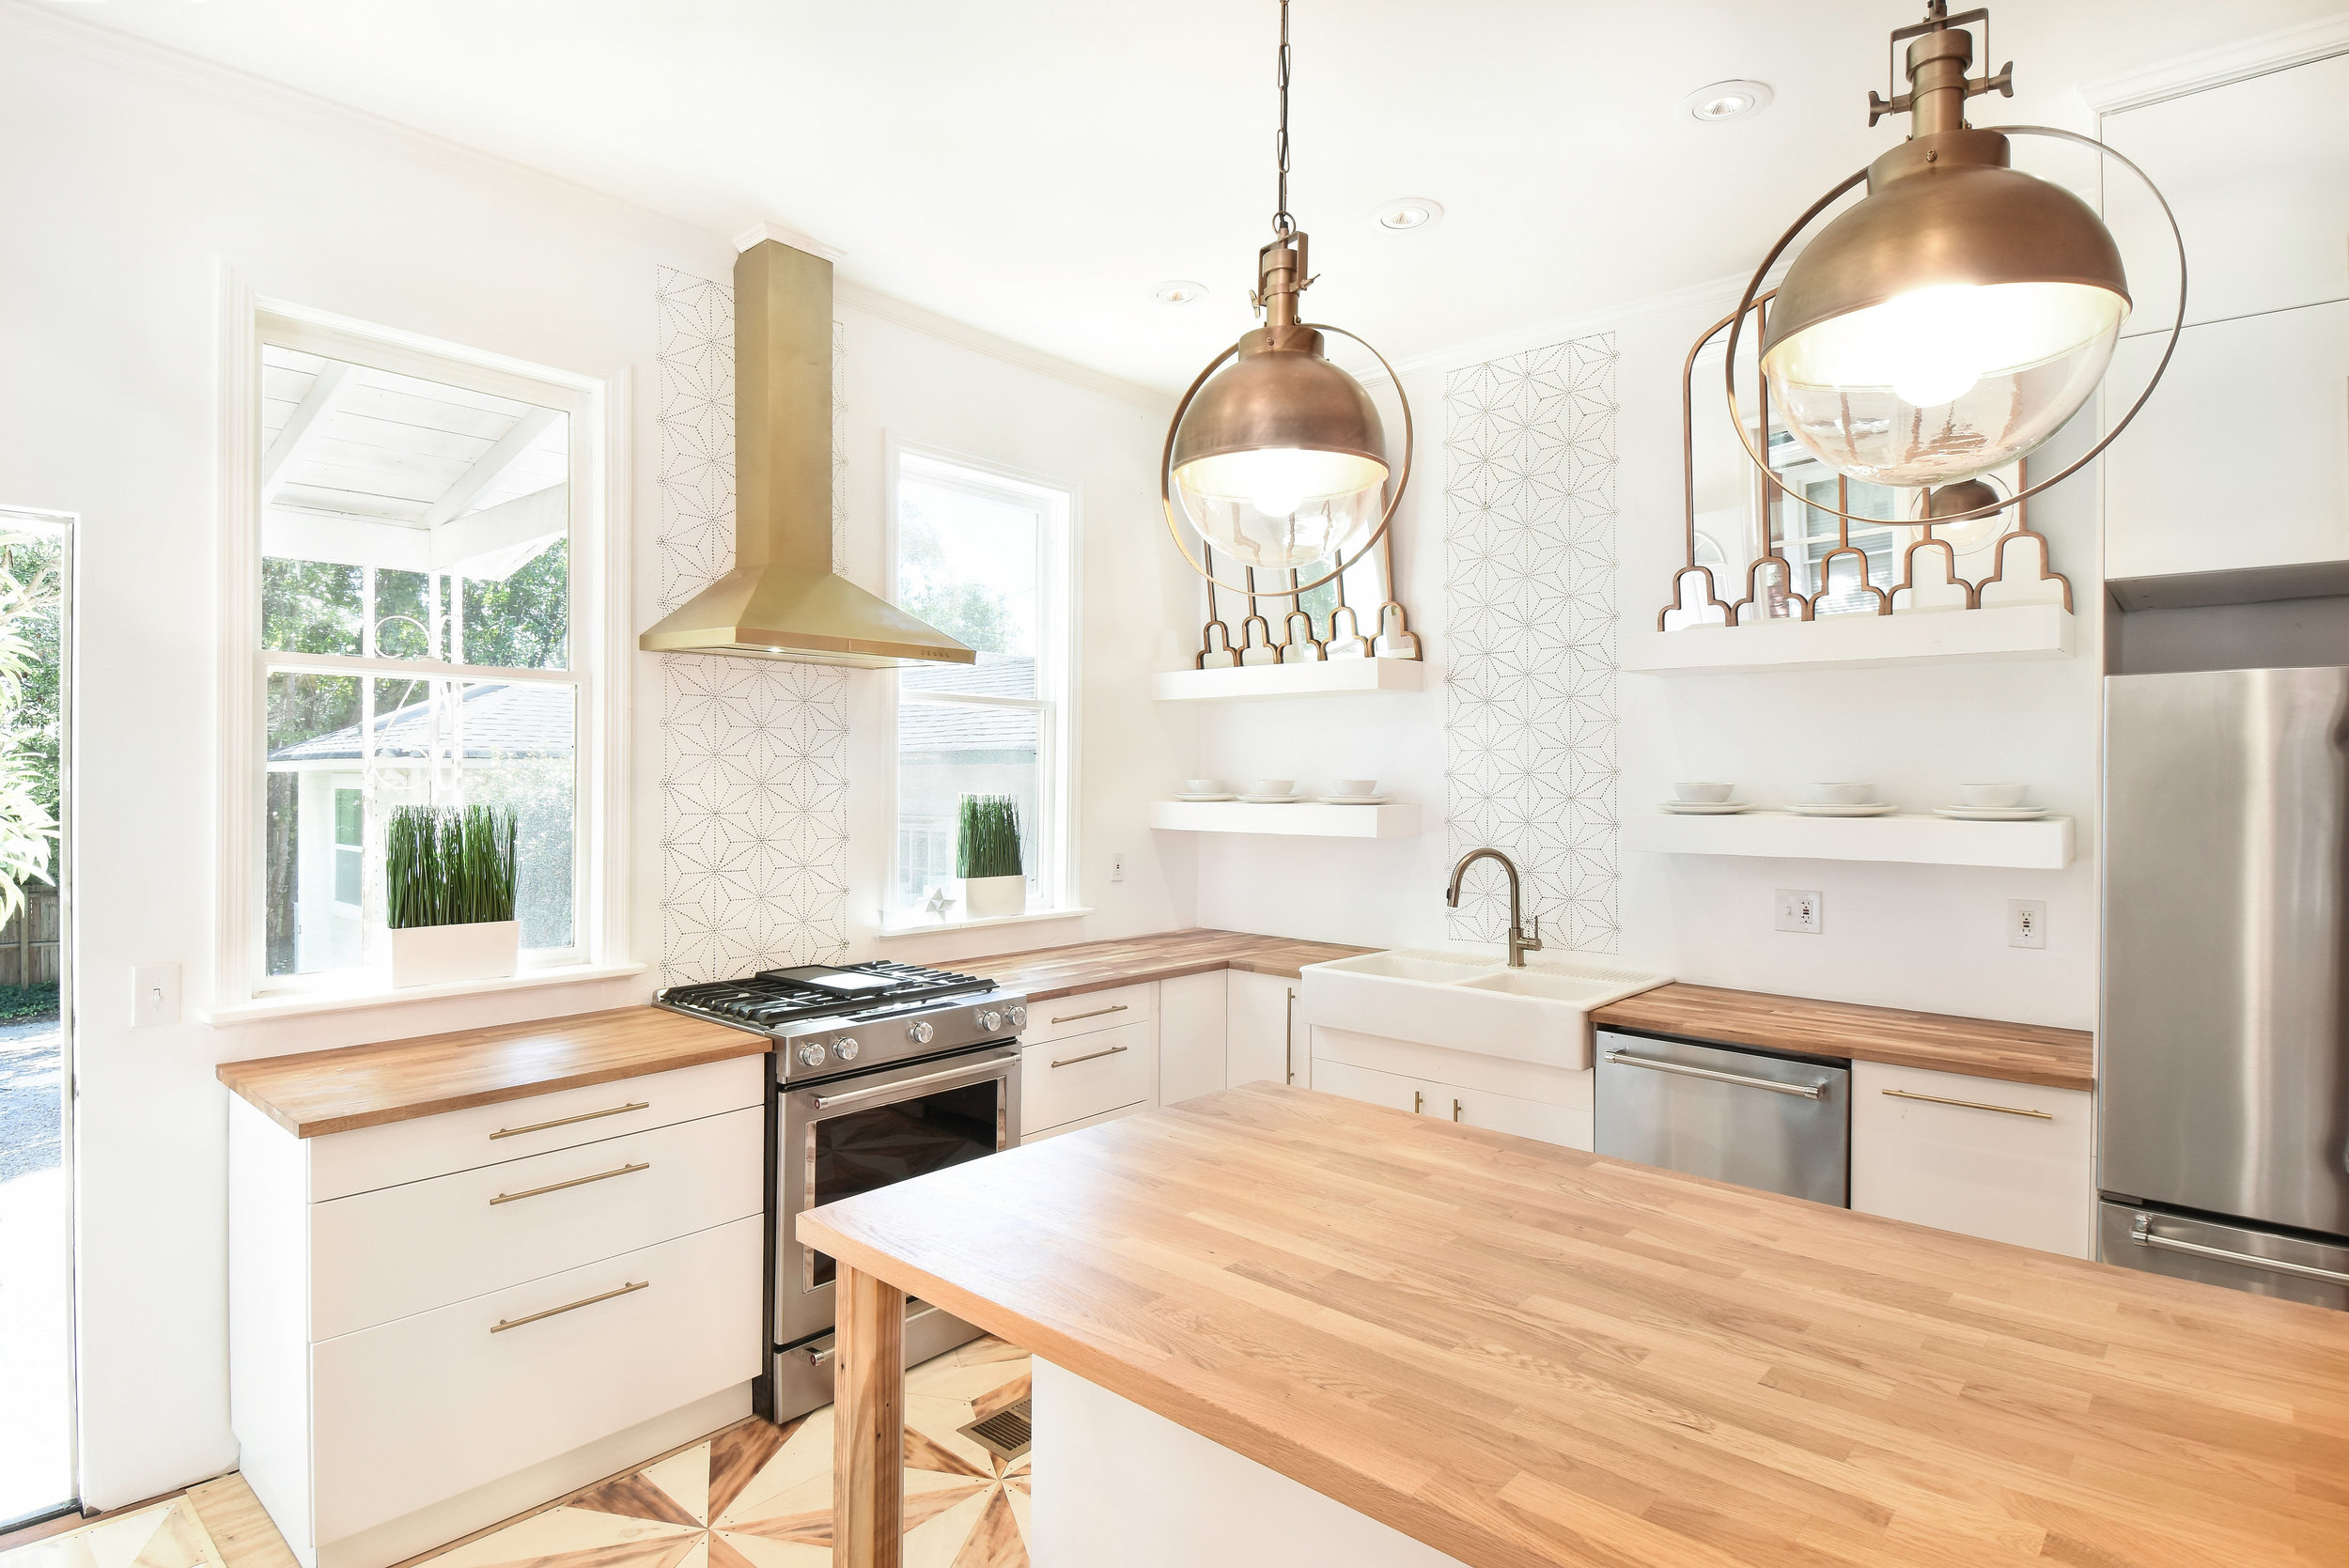 KitchenAngle1.jpg